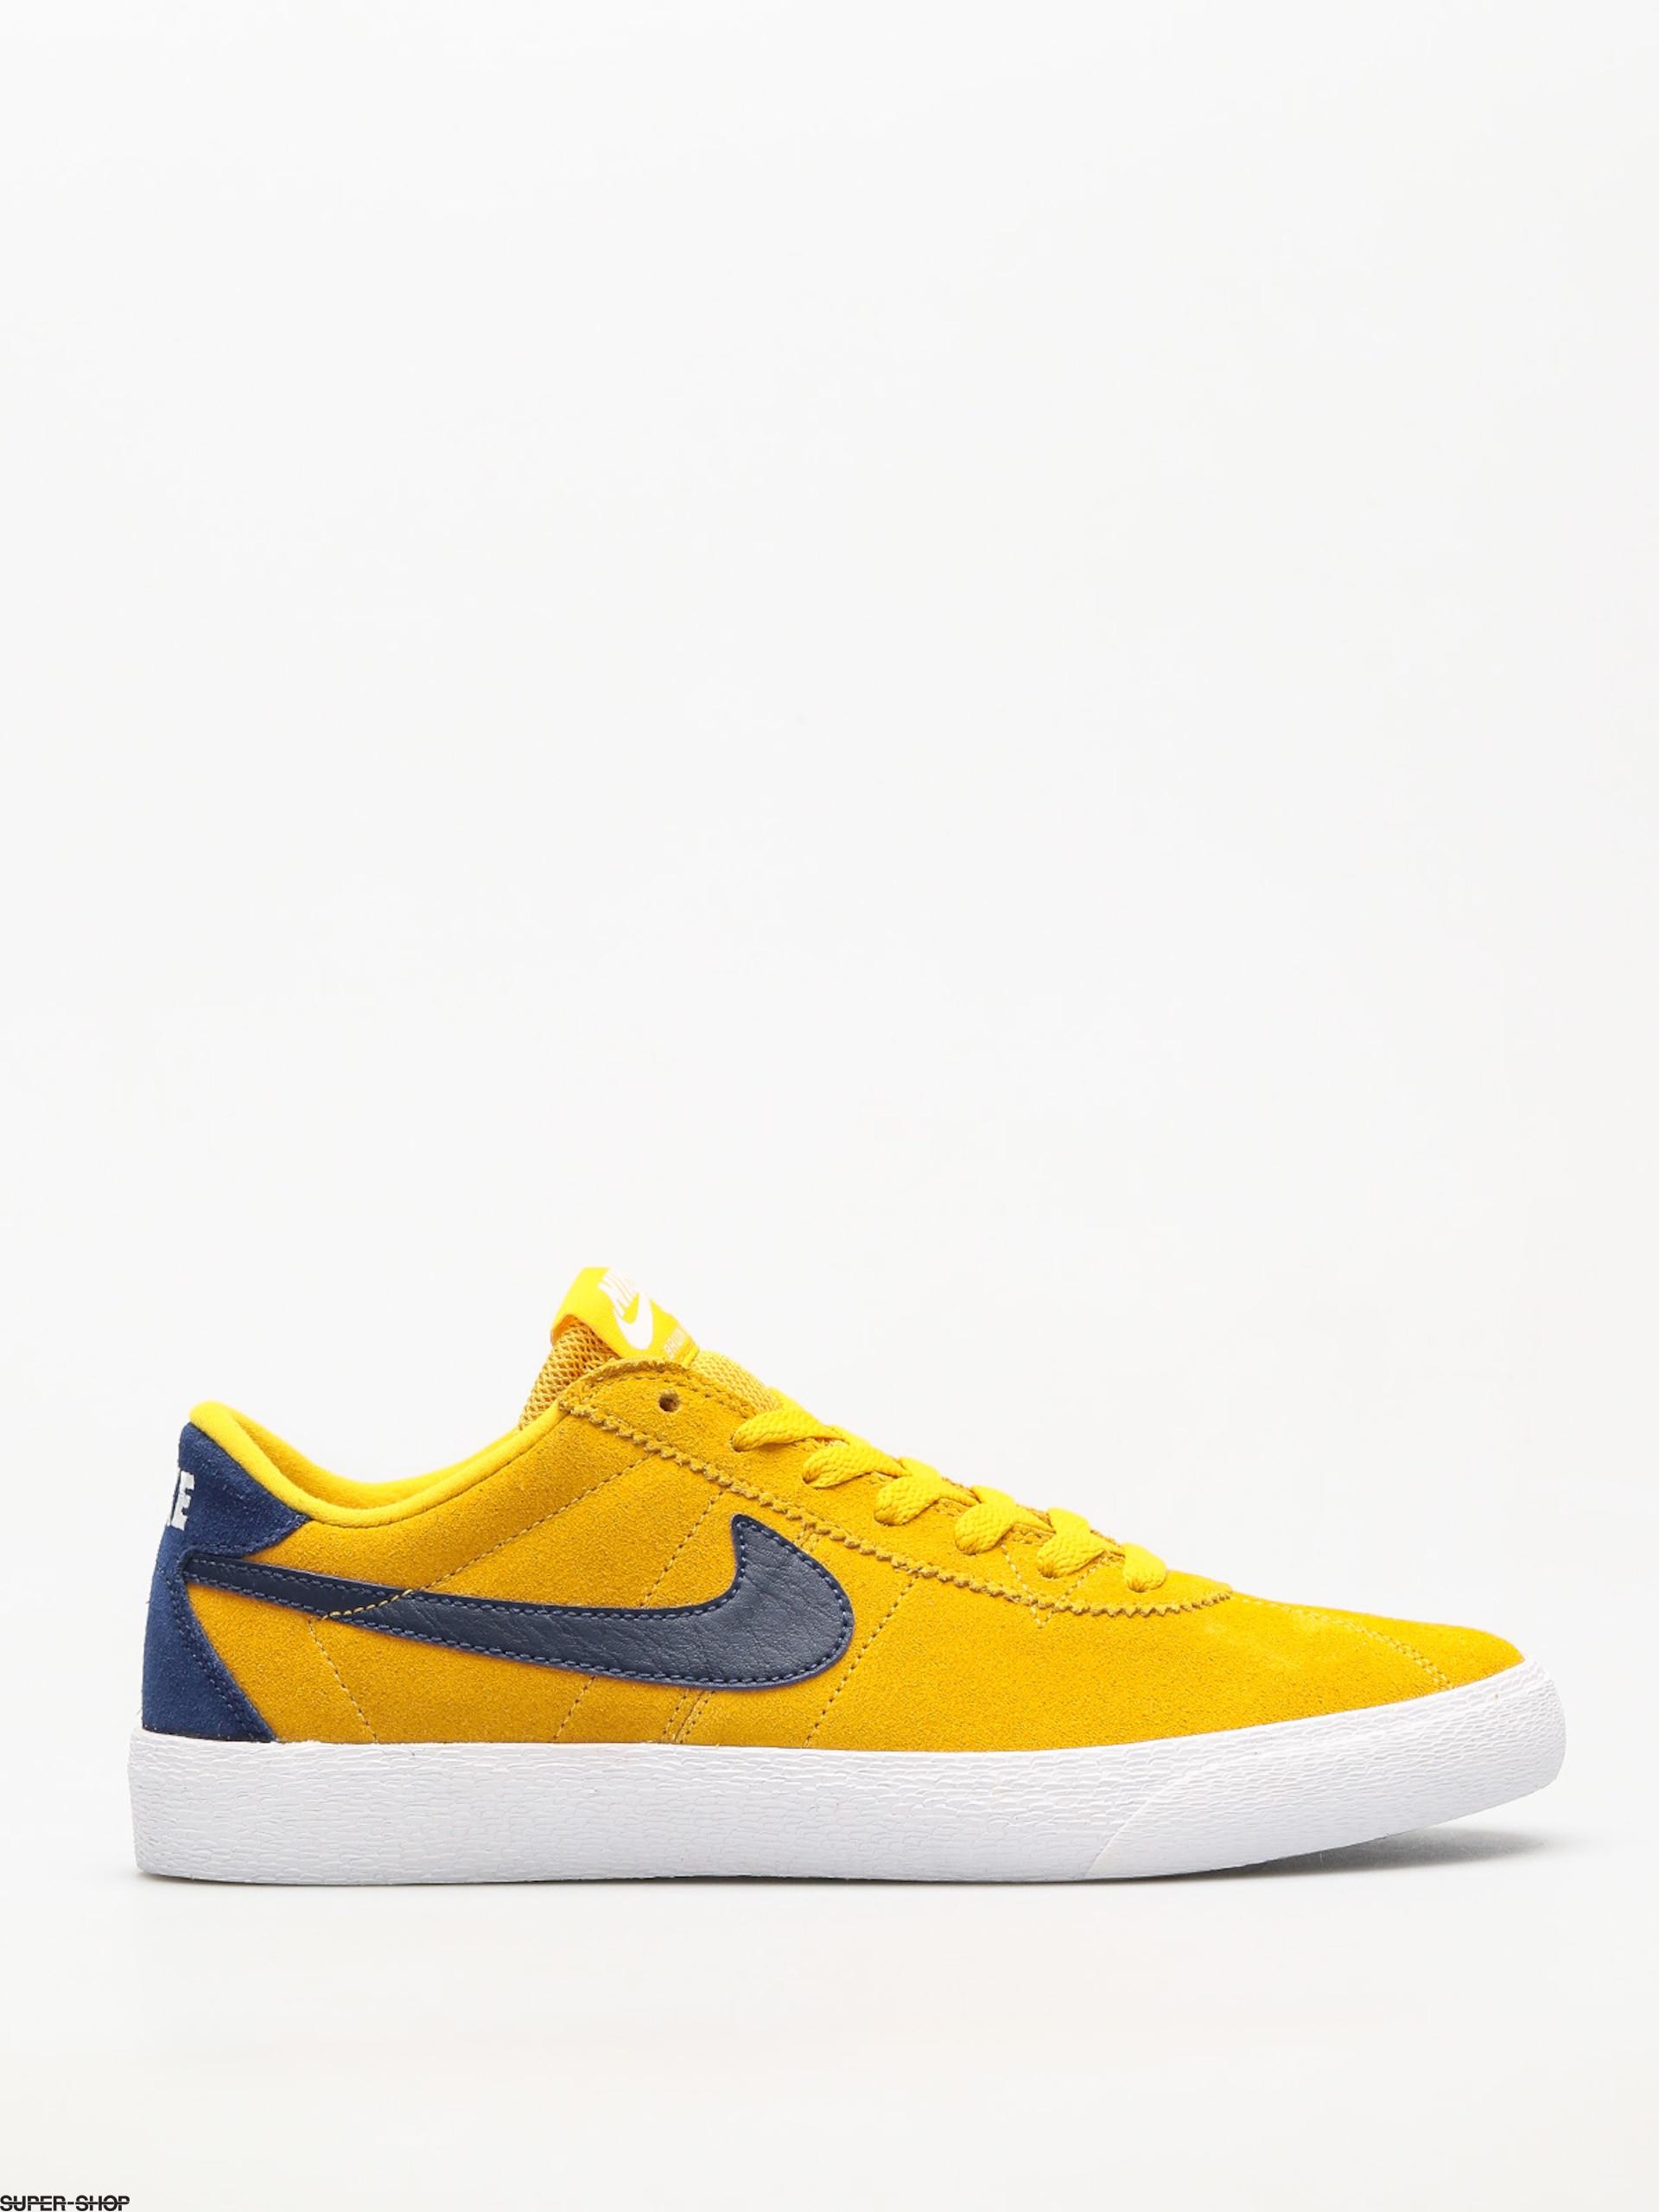 873276831c31 Nike SB Shoes Sb Bruin Lo Wmn (yellow ochre blue void white)